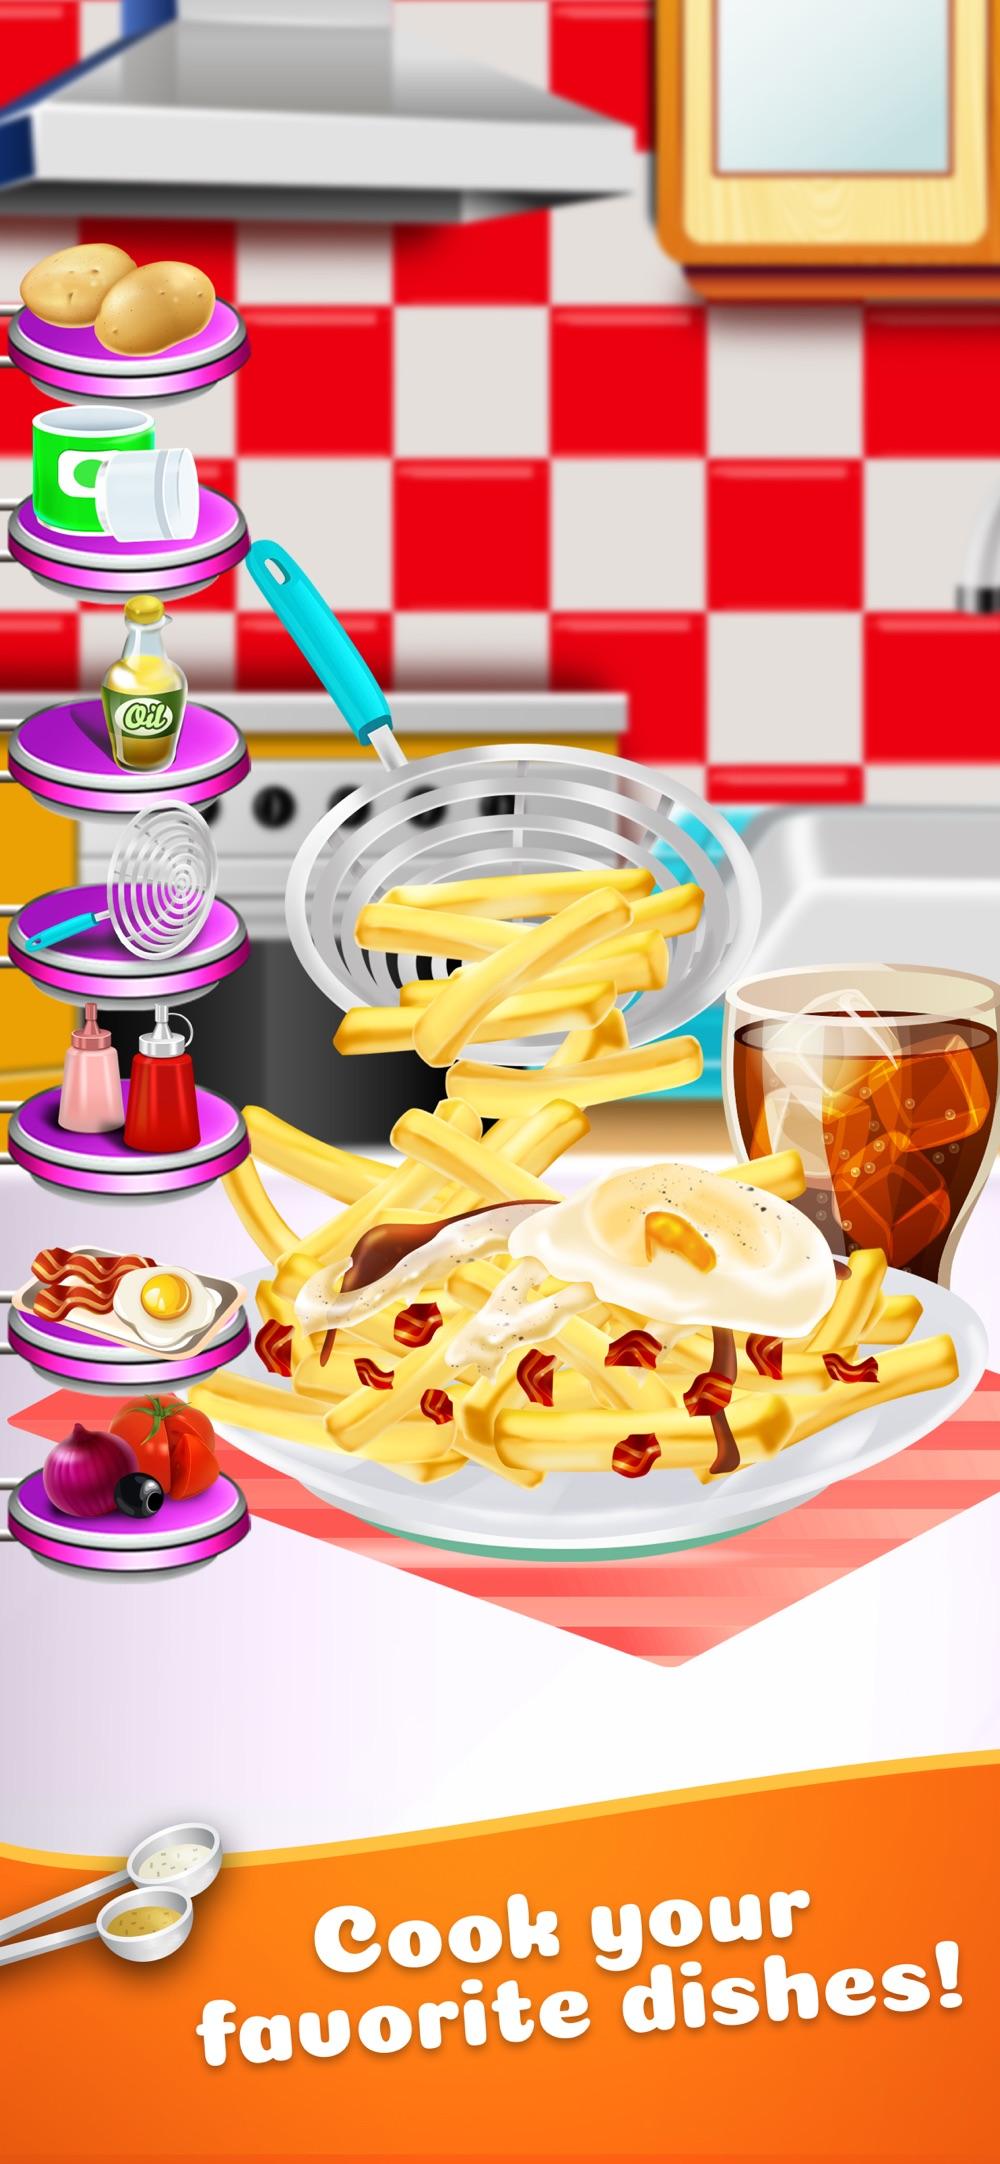 Sushi Food Maker Cooking Games hack tool